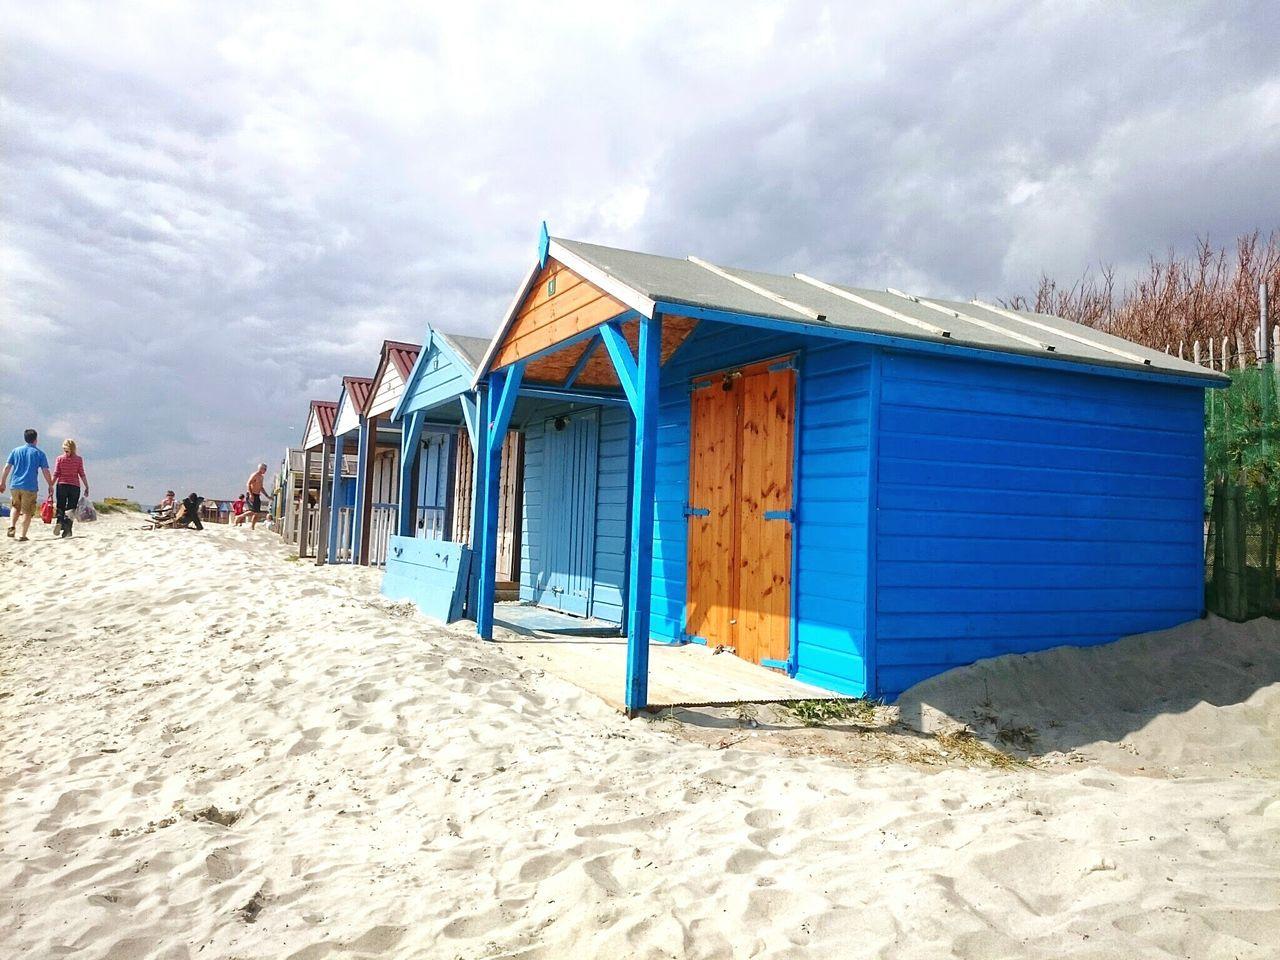 Sand Beach Multi Colored Sky Beach Hut Chichester Harbour Summer